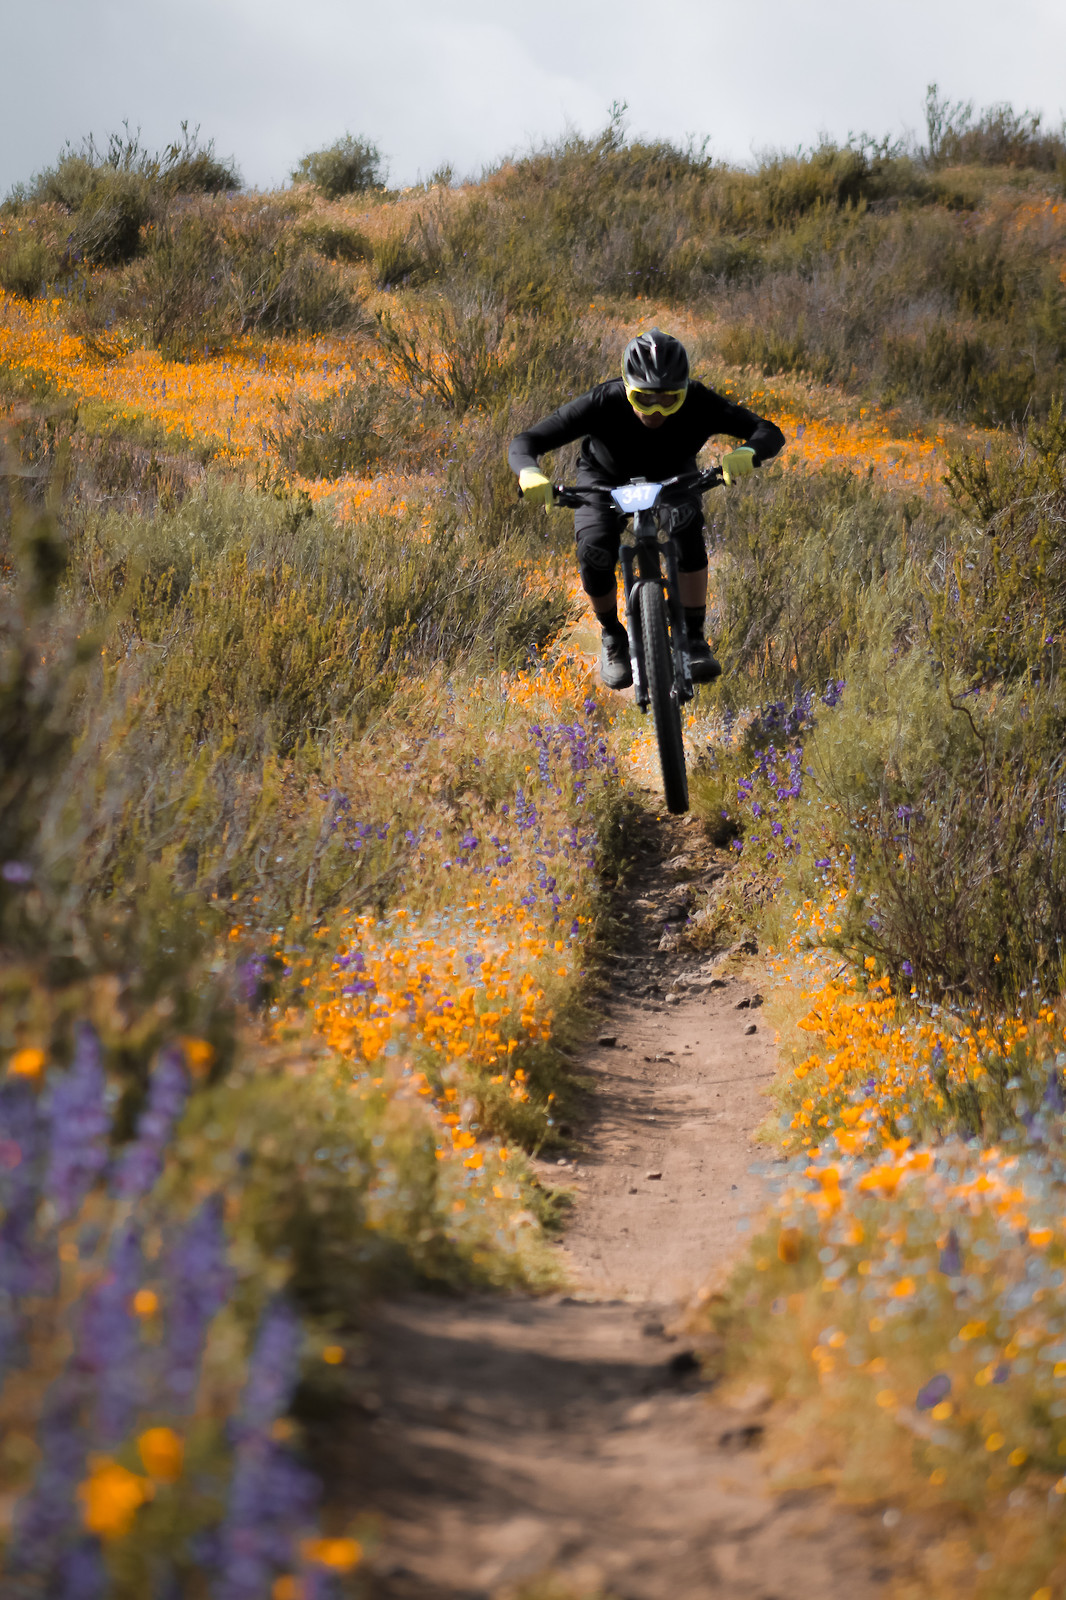 IMG 2058 - Liam Donohue - Mountain Biking Pictures - Vital MTB